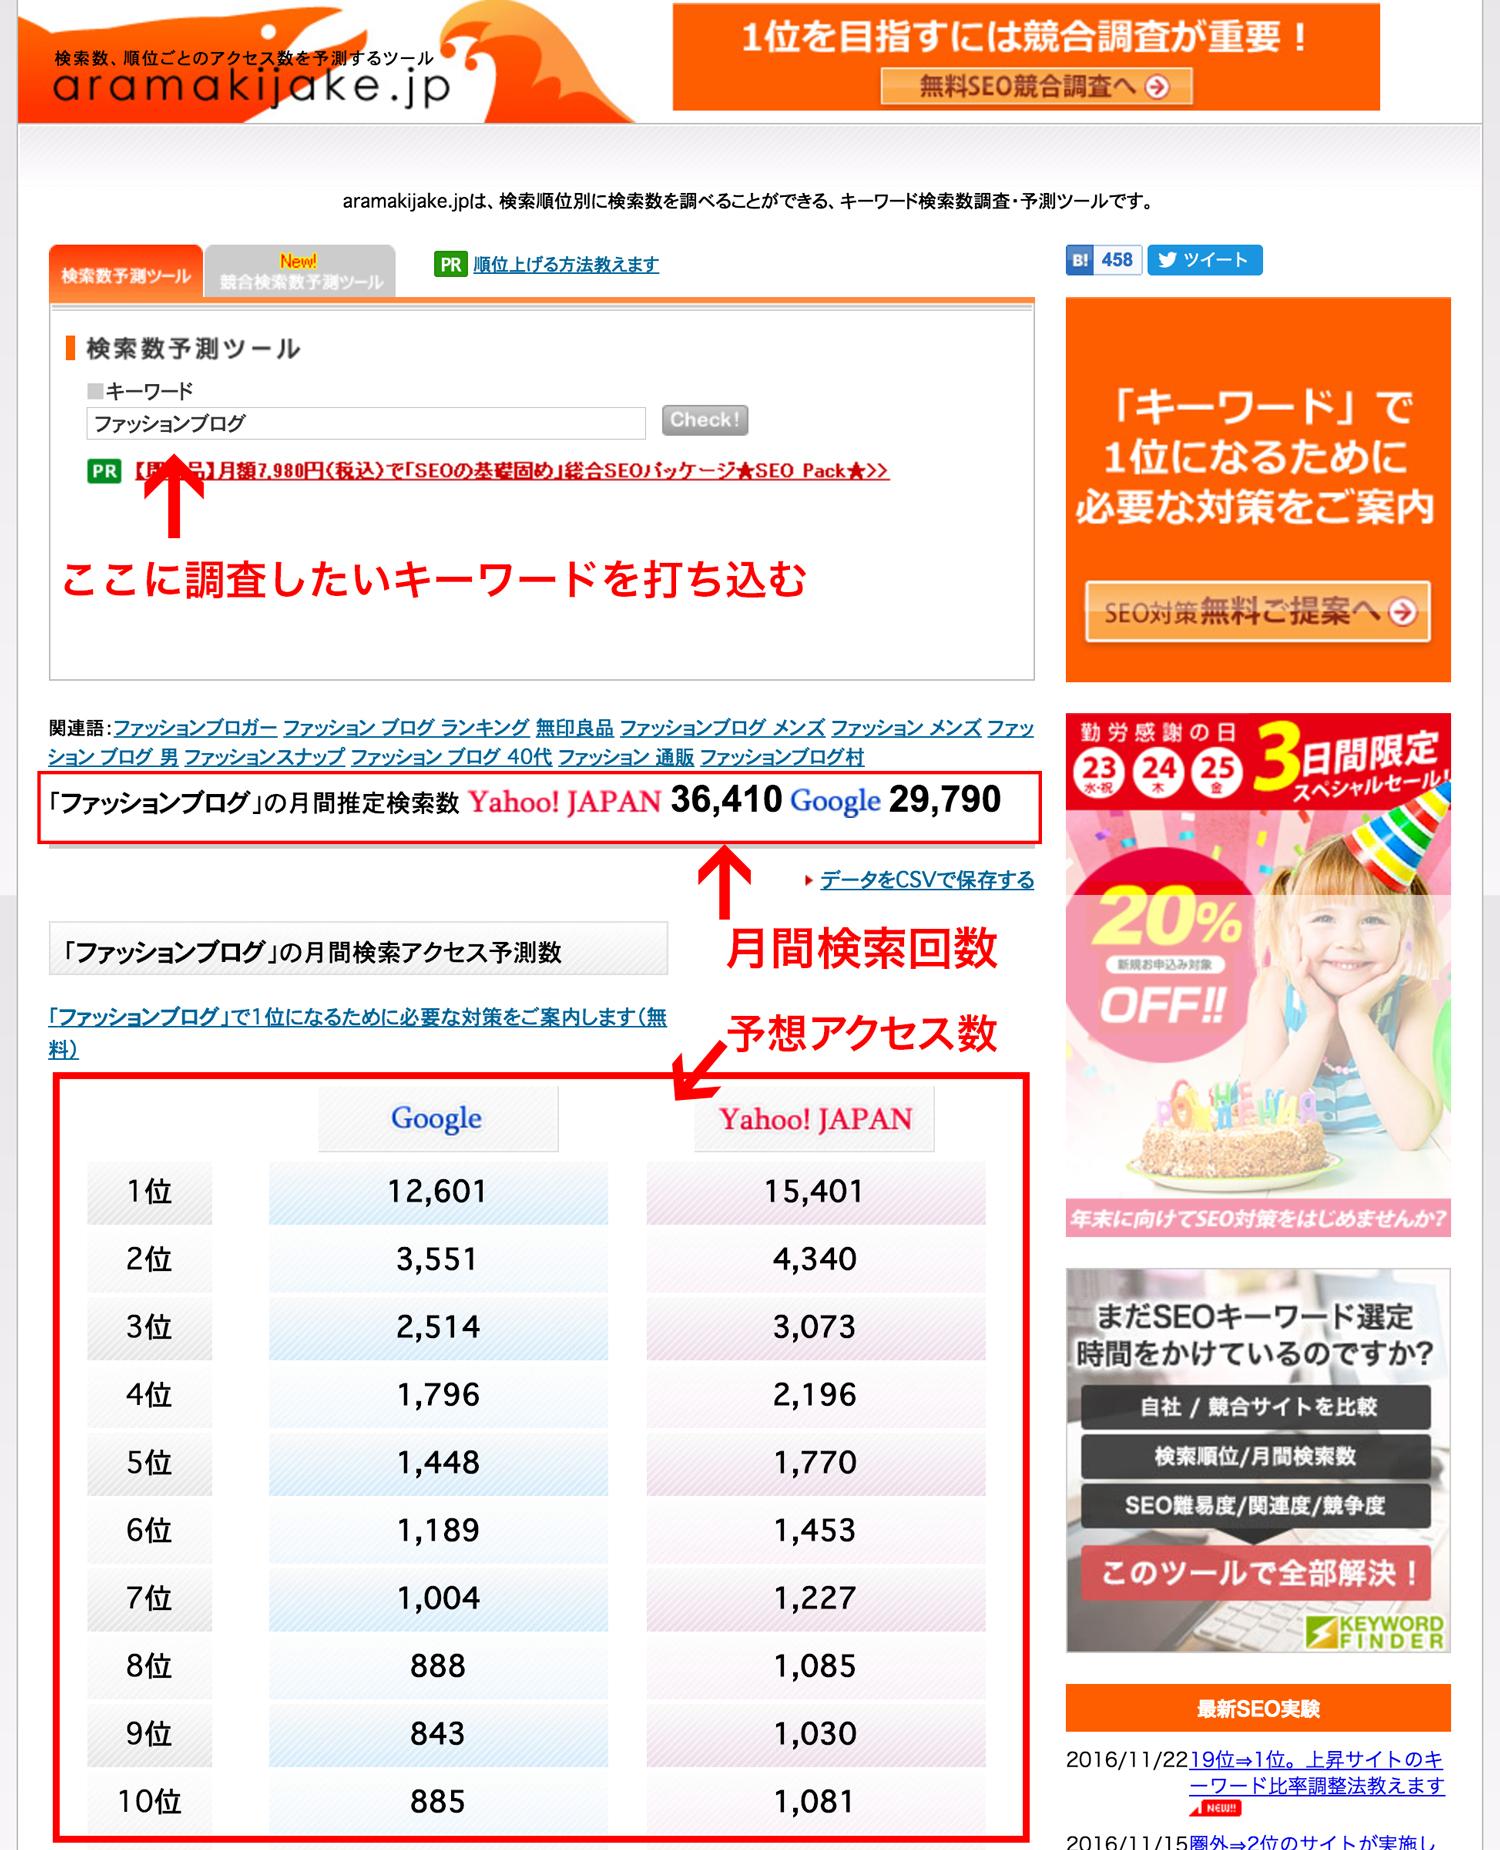 aramakijyake キーワード月間検索回数を調査出来るサイト